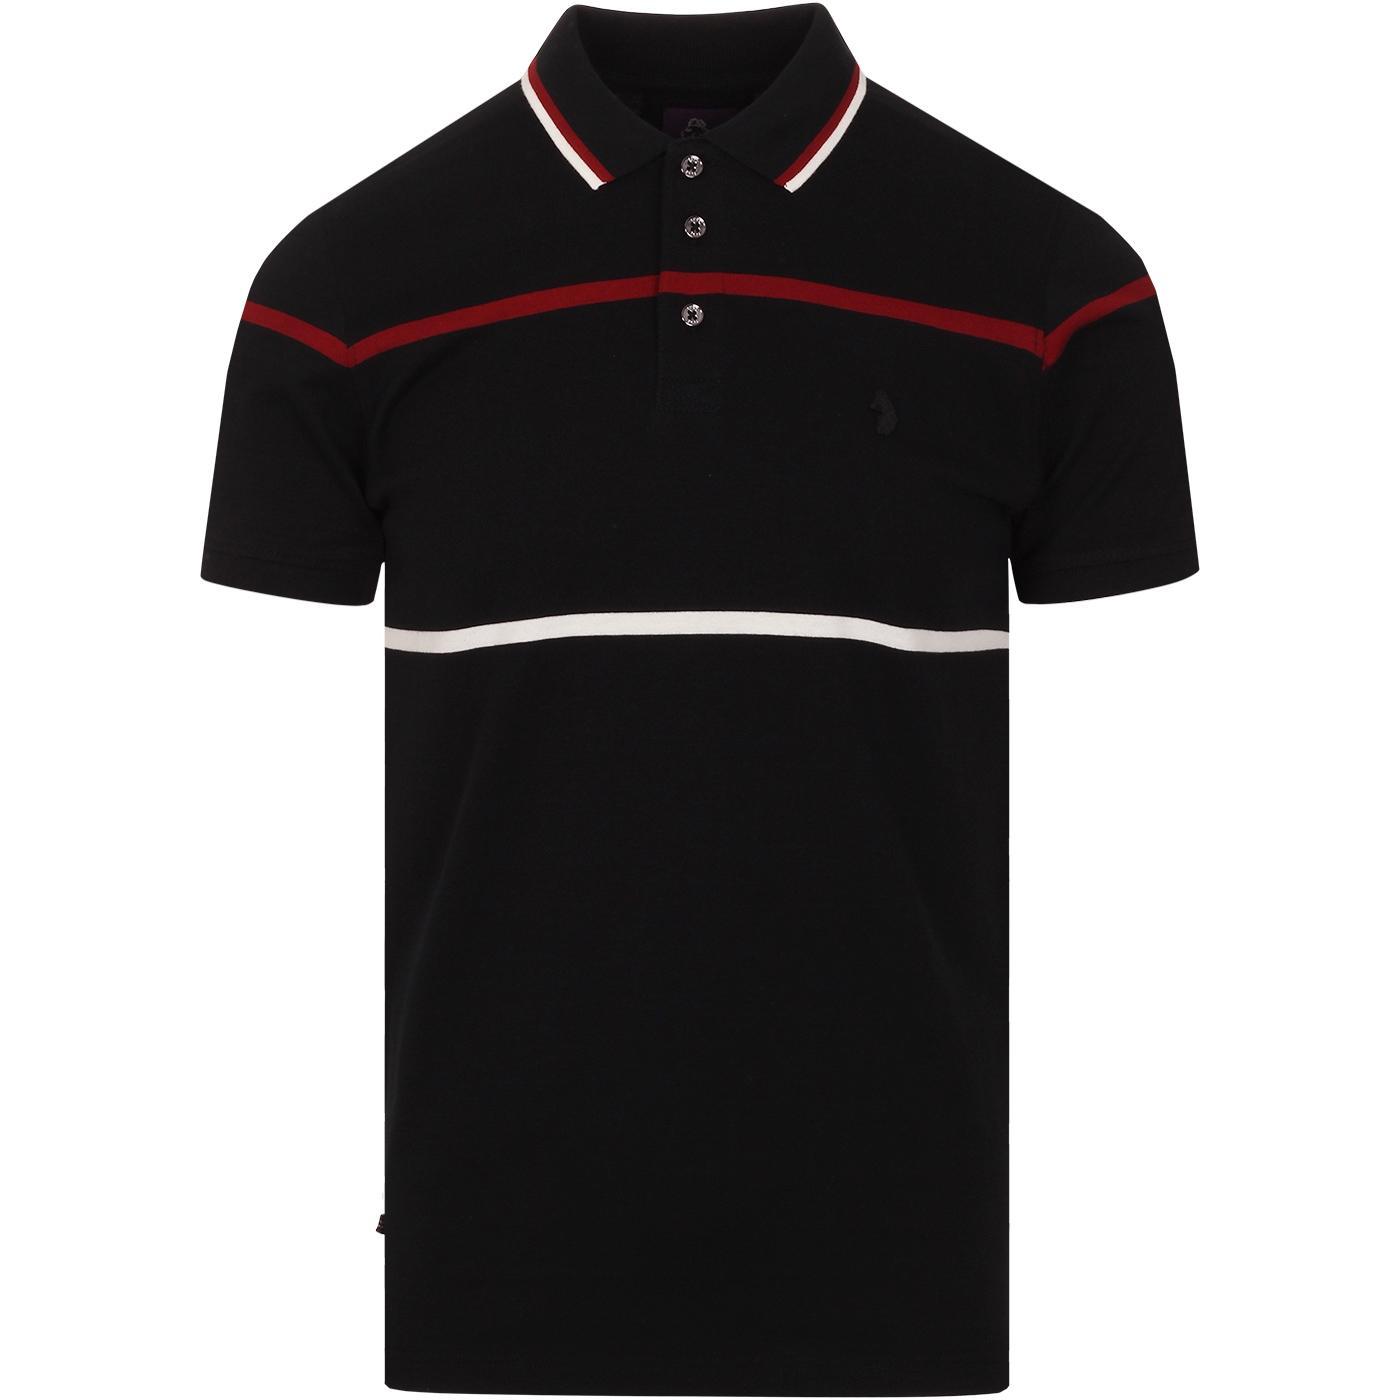 O'Brien LUKE Retro Mod Yarn Dyed Stripe Polo Top